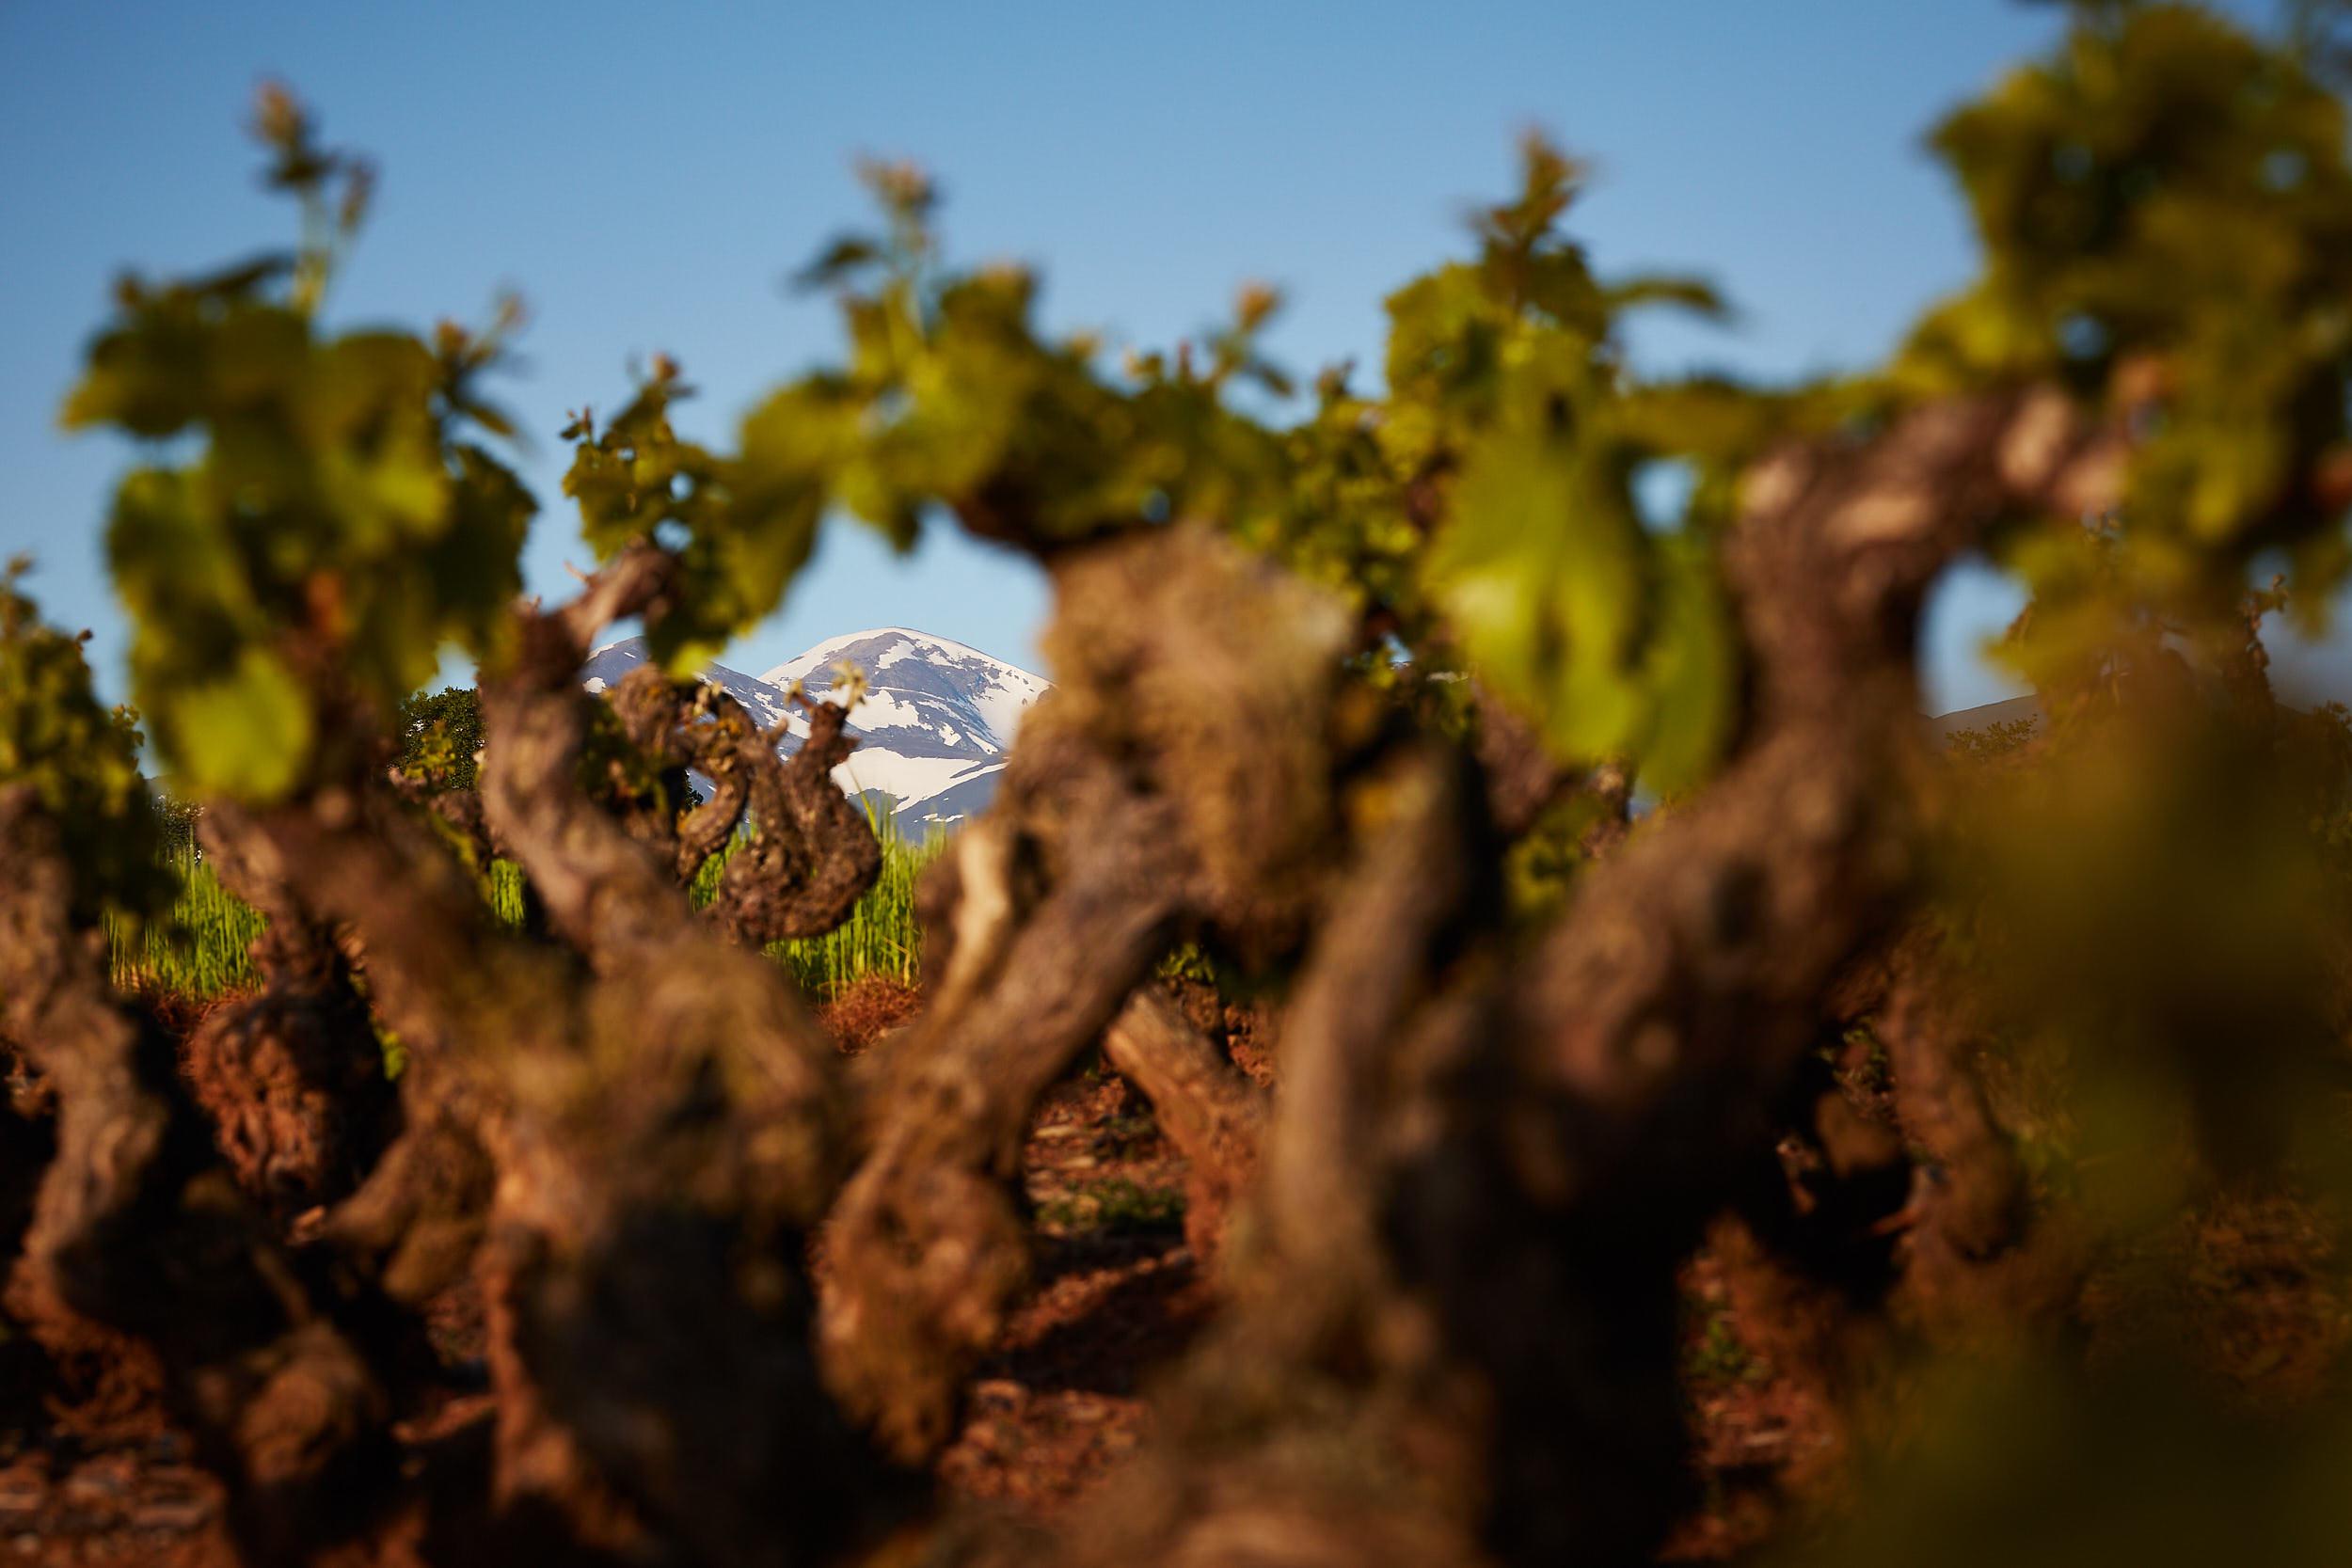 1805fotografia-profesional-corporativa-vino-rioja-espana-James-Sturcke_0014.jpg